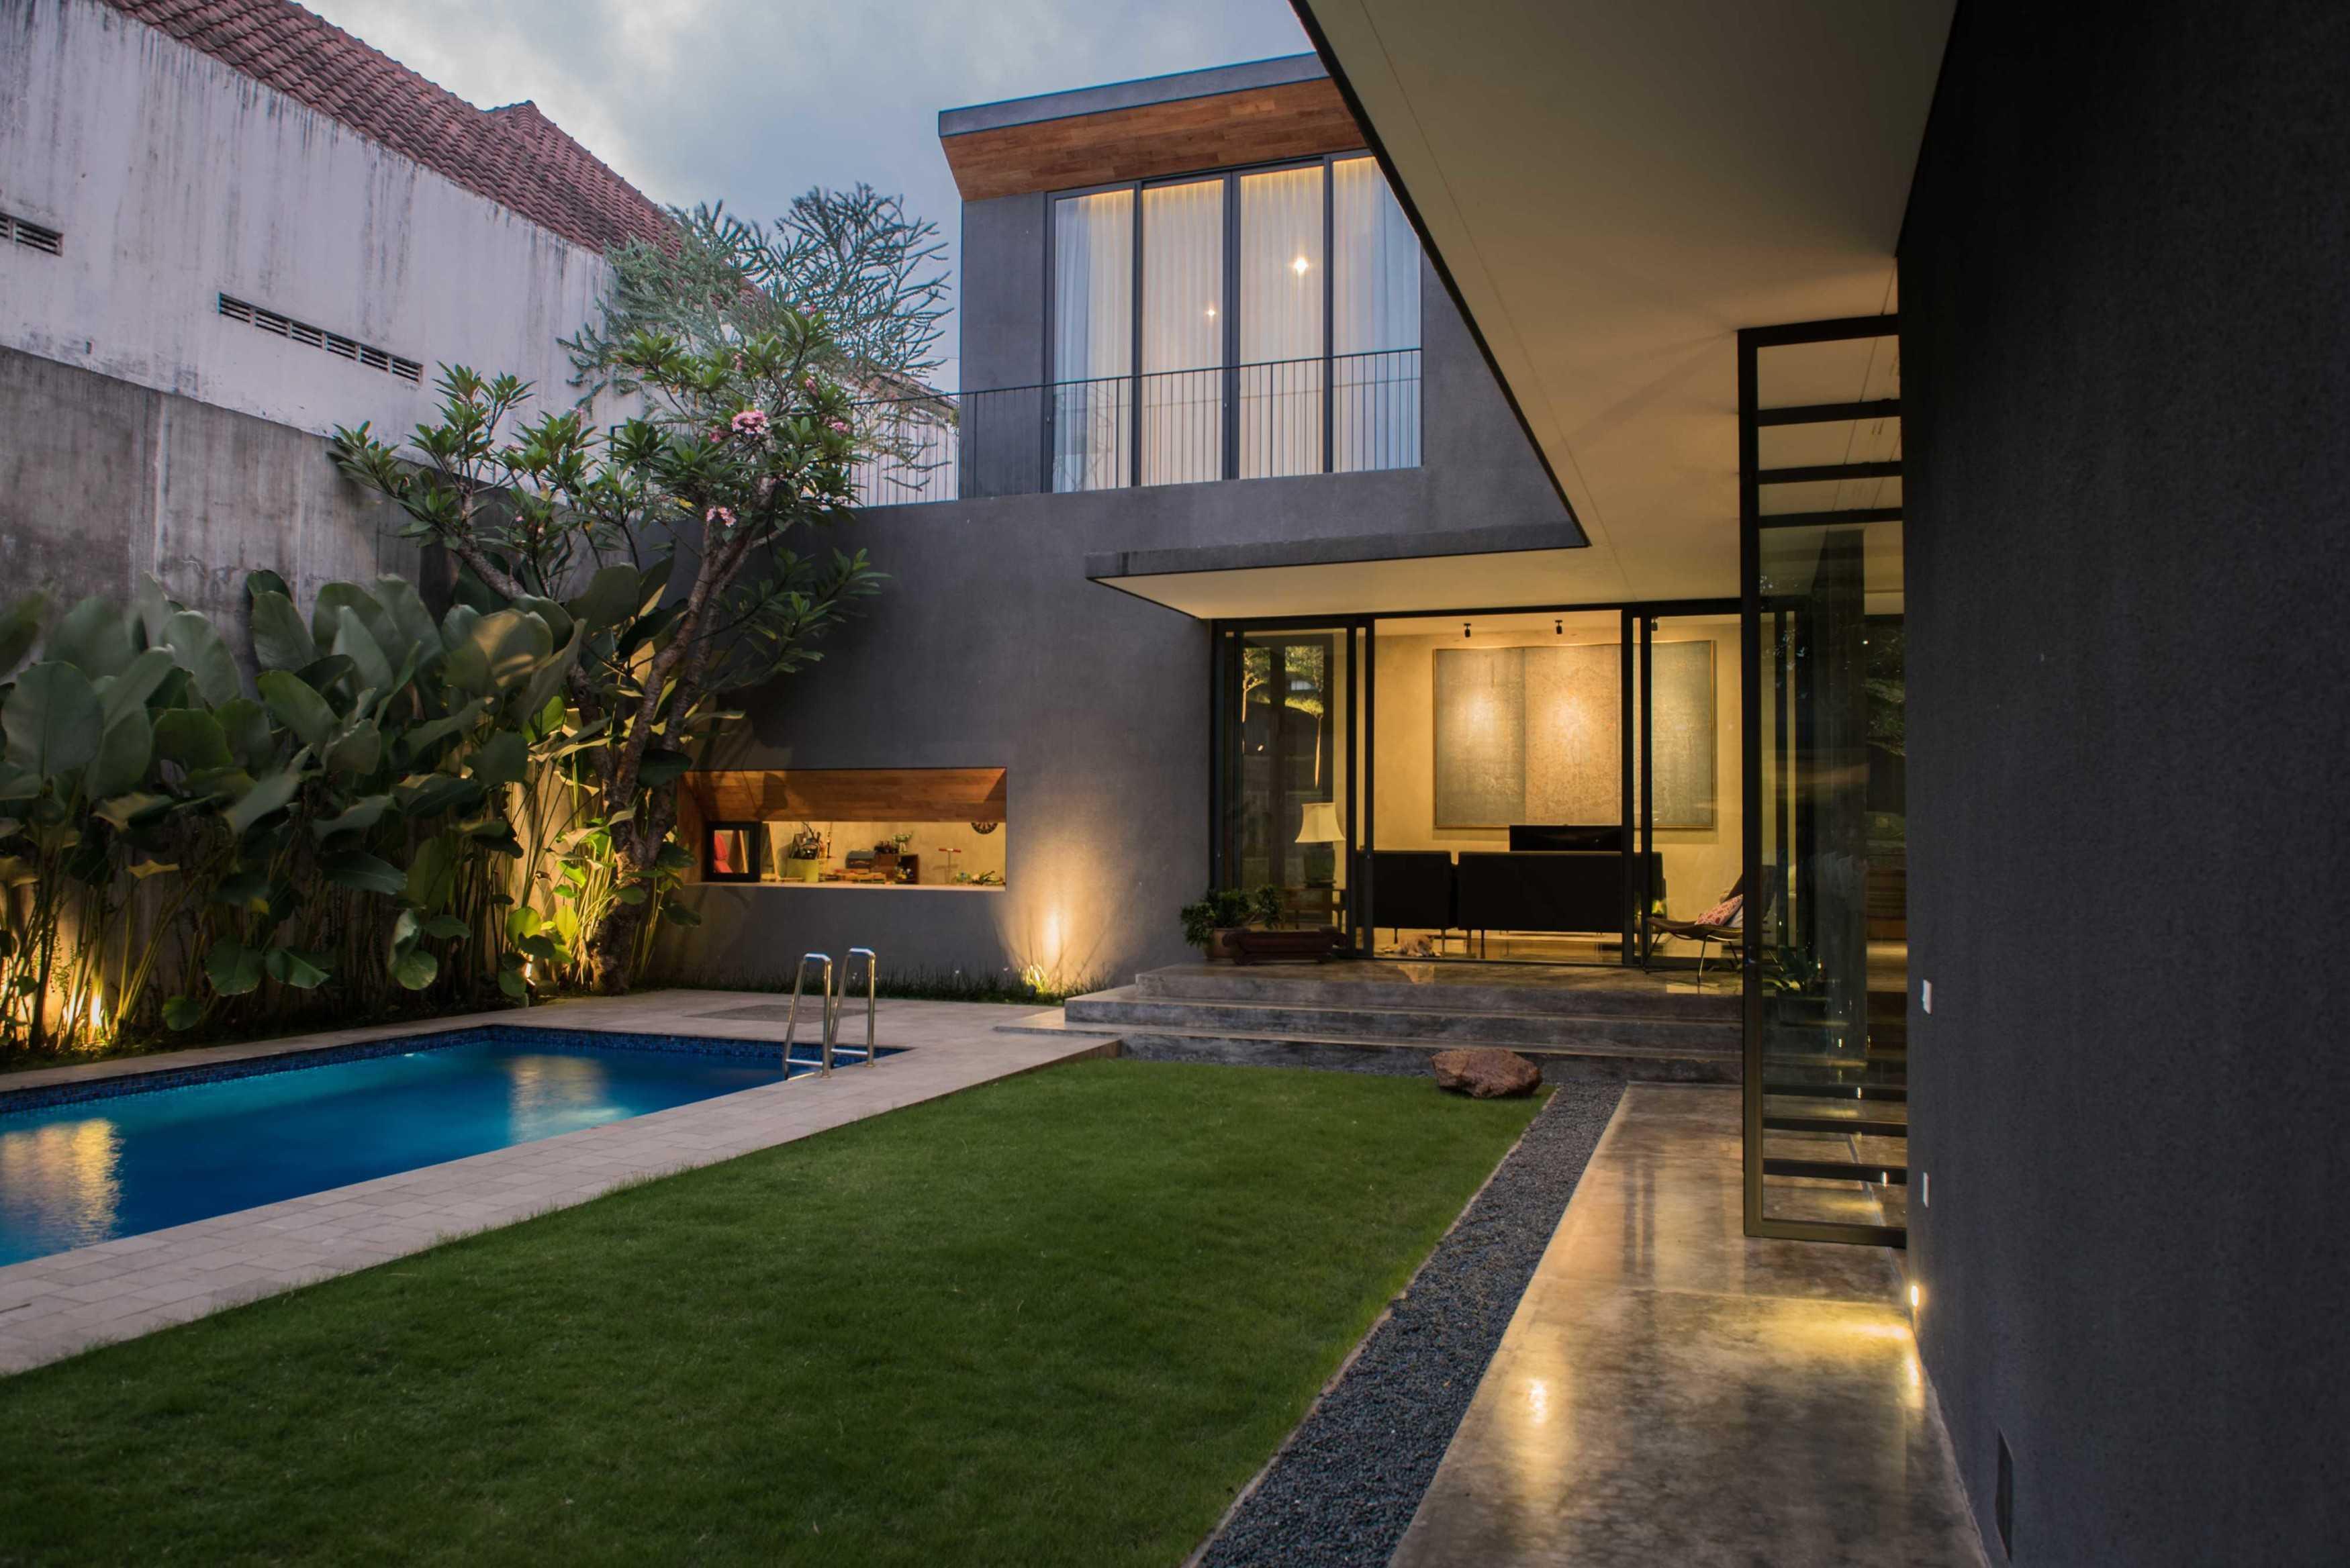 Tamara Wibowo House 1 Semarang, Semarang City, Central Java, Indonesia Semarang, Indonesia Swimming Pool View   17950